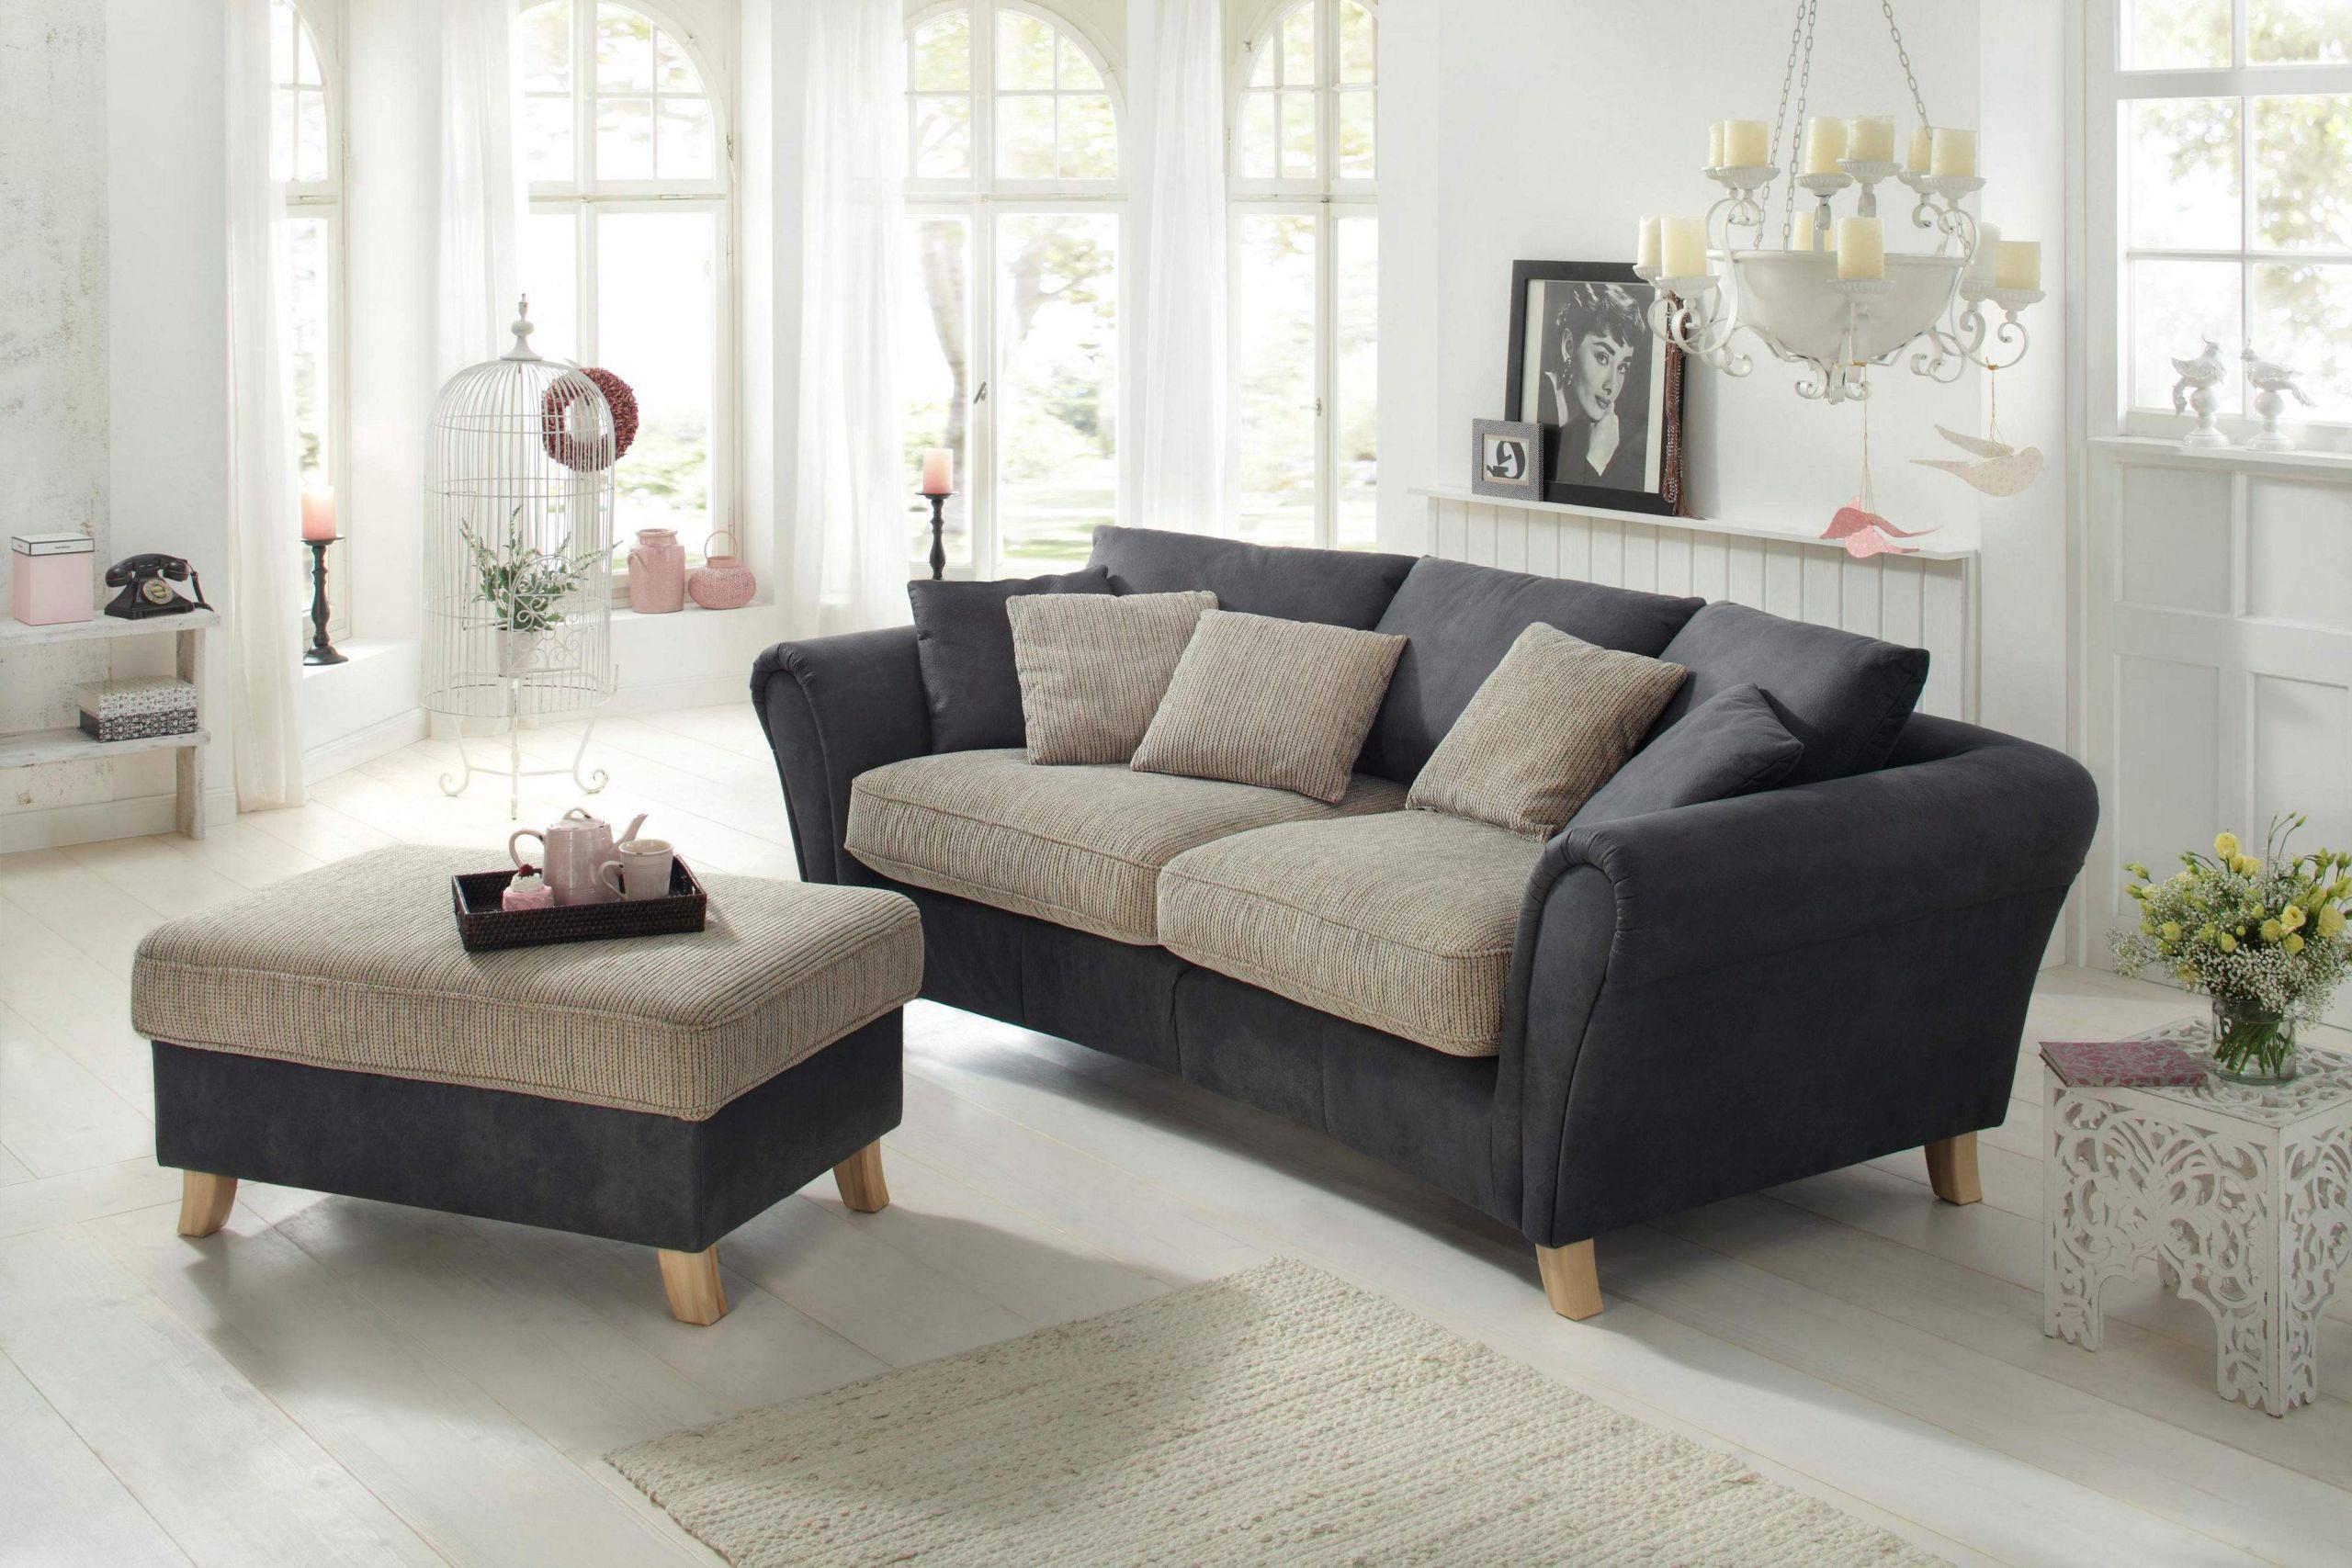 55 liebenswurdig lager von baur big sofa pd3kaewb of big sofa mit sessel